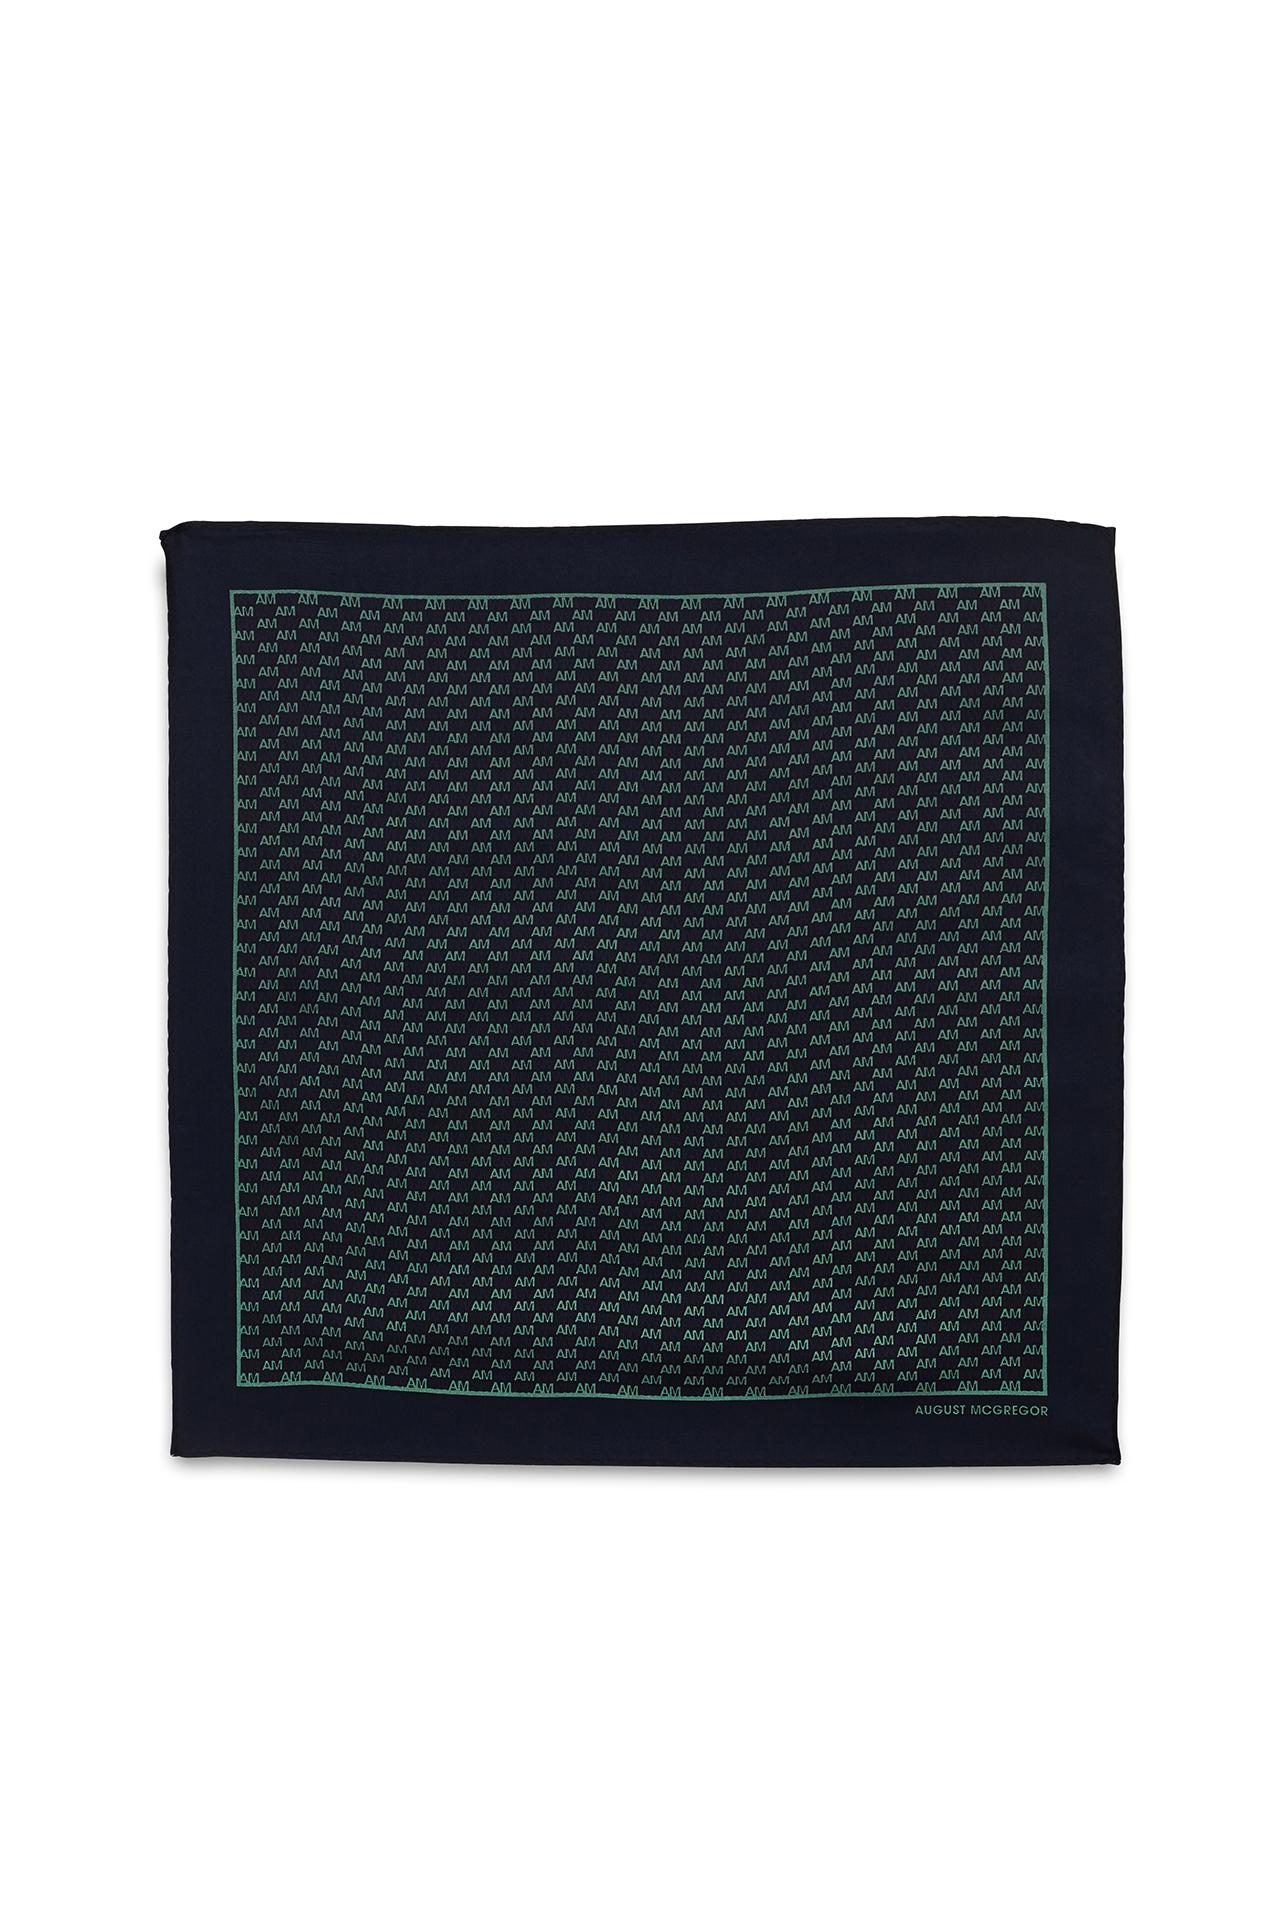 AM Check Navy Green Pocket Square